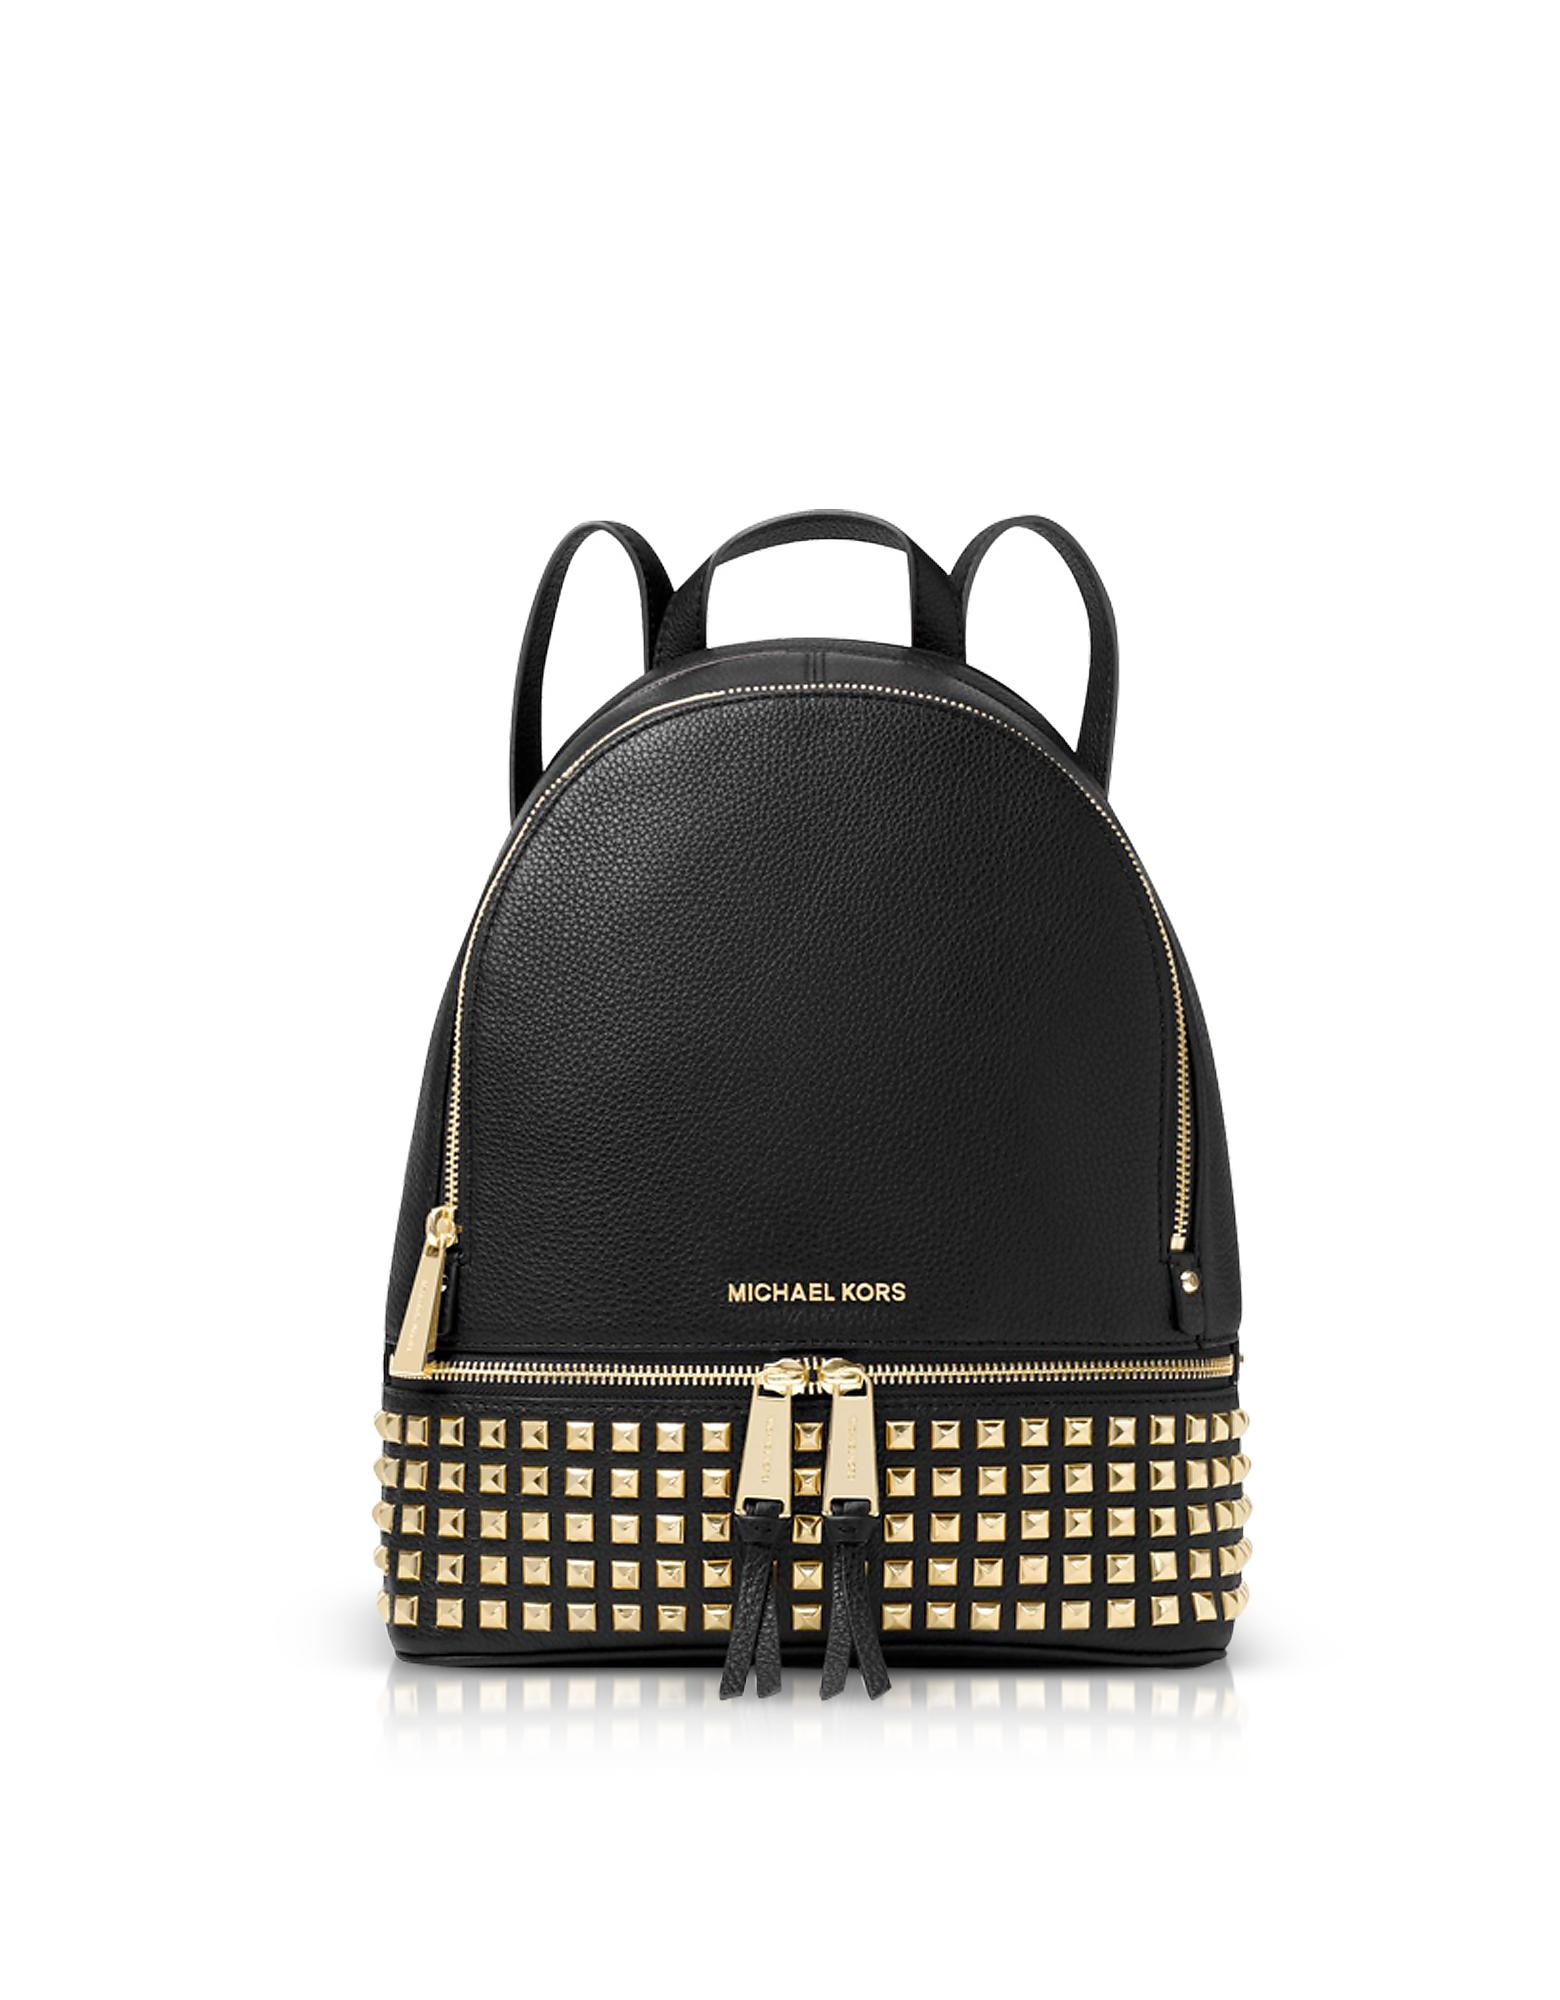 931de476bdce Michael Kors - Black Rhea Medium Studded Leather Backpack - Lyst. View  fullscreen